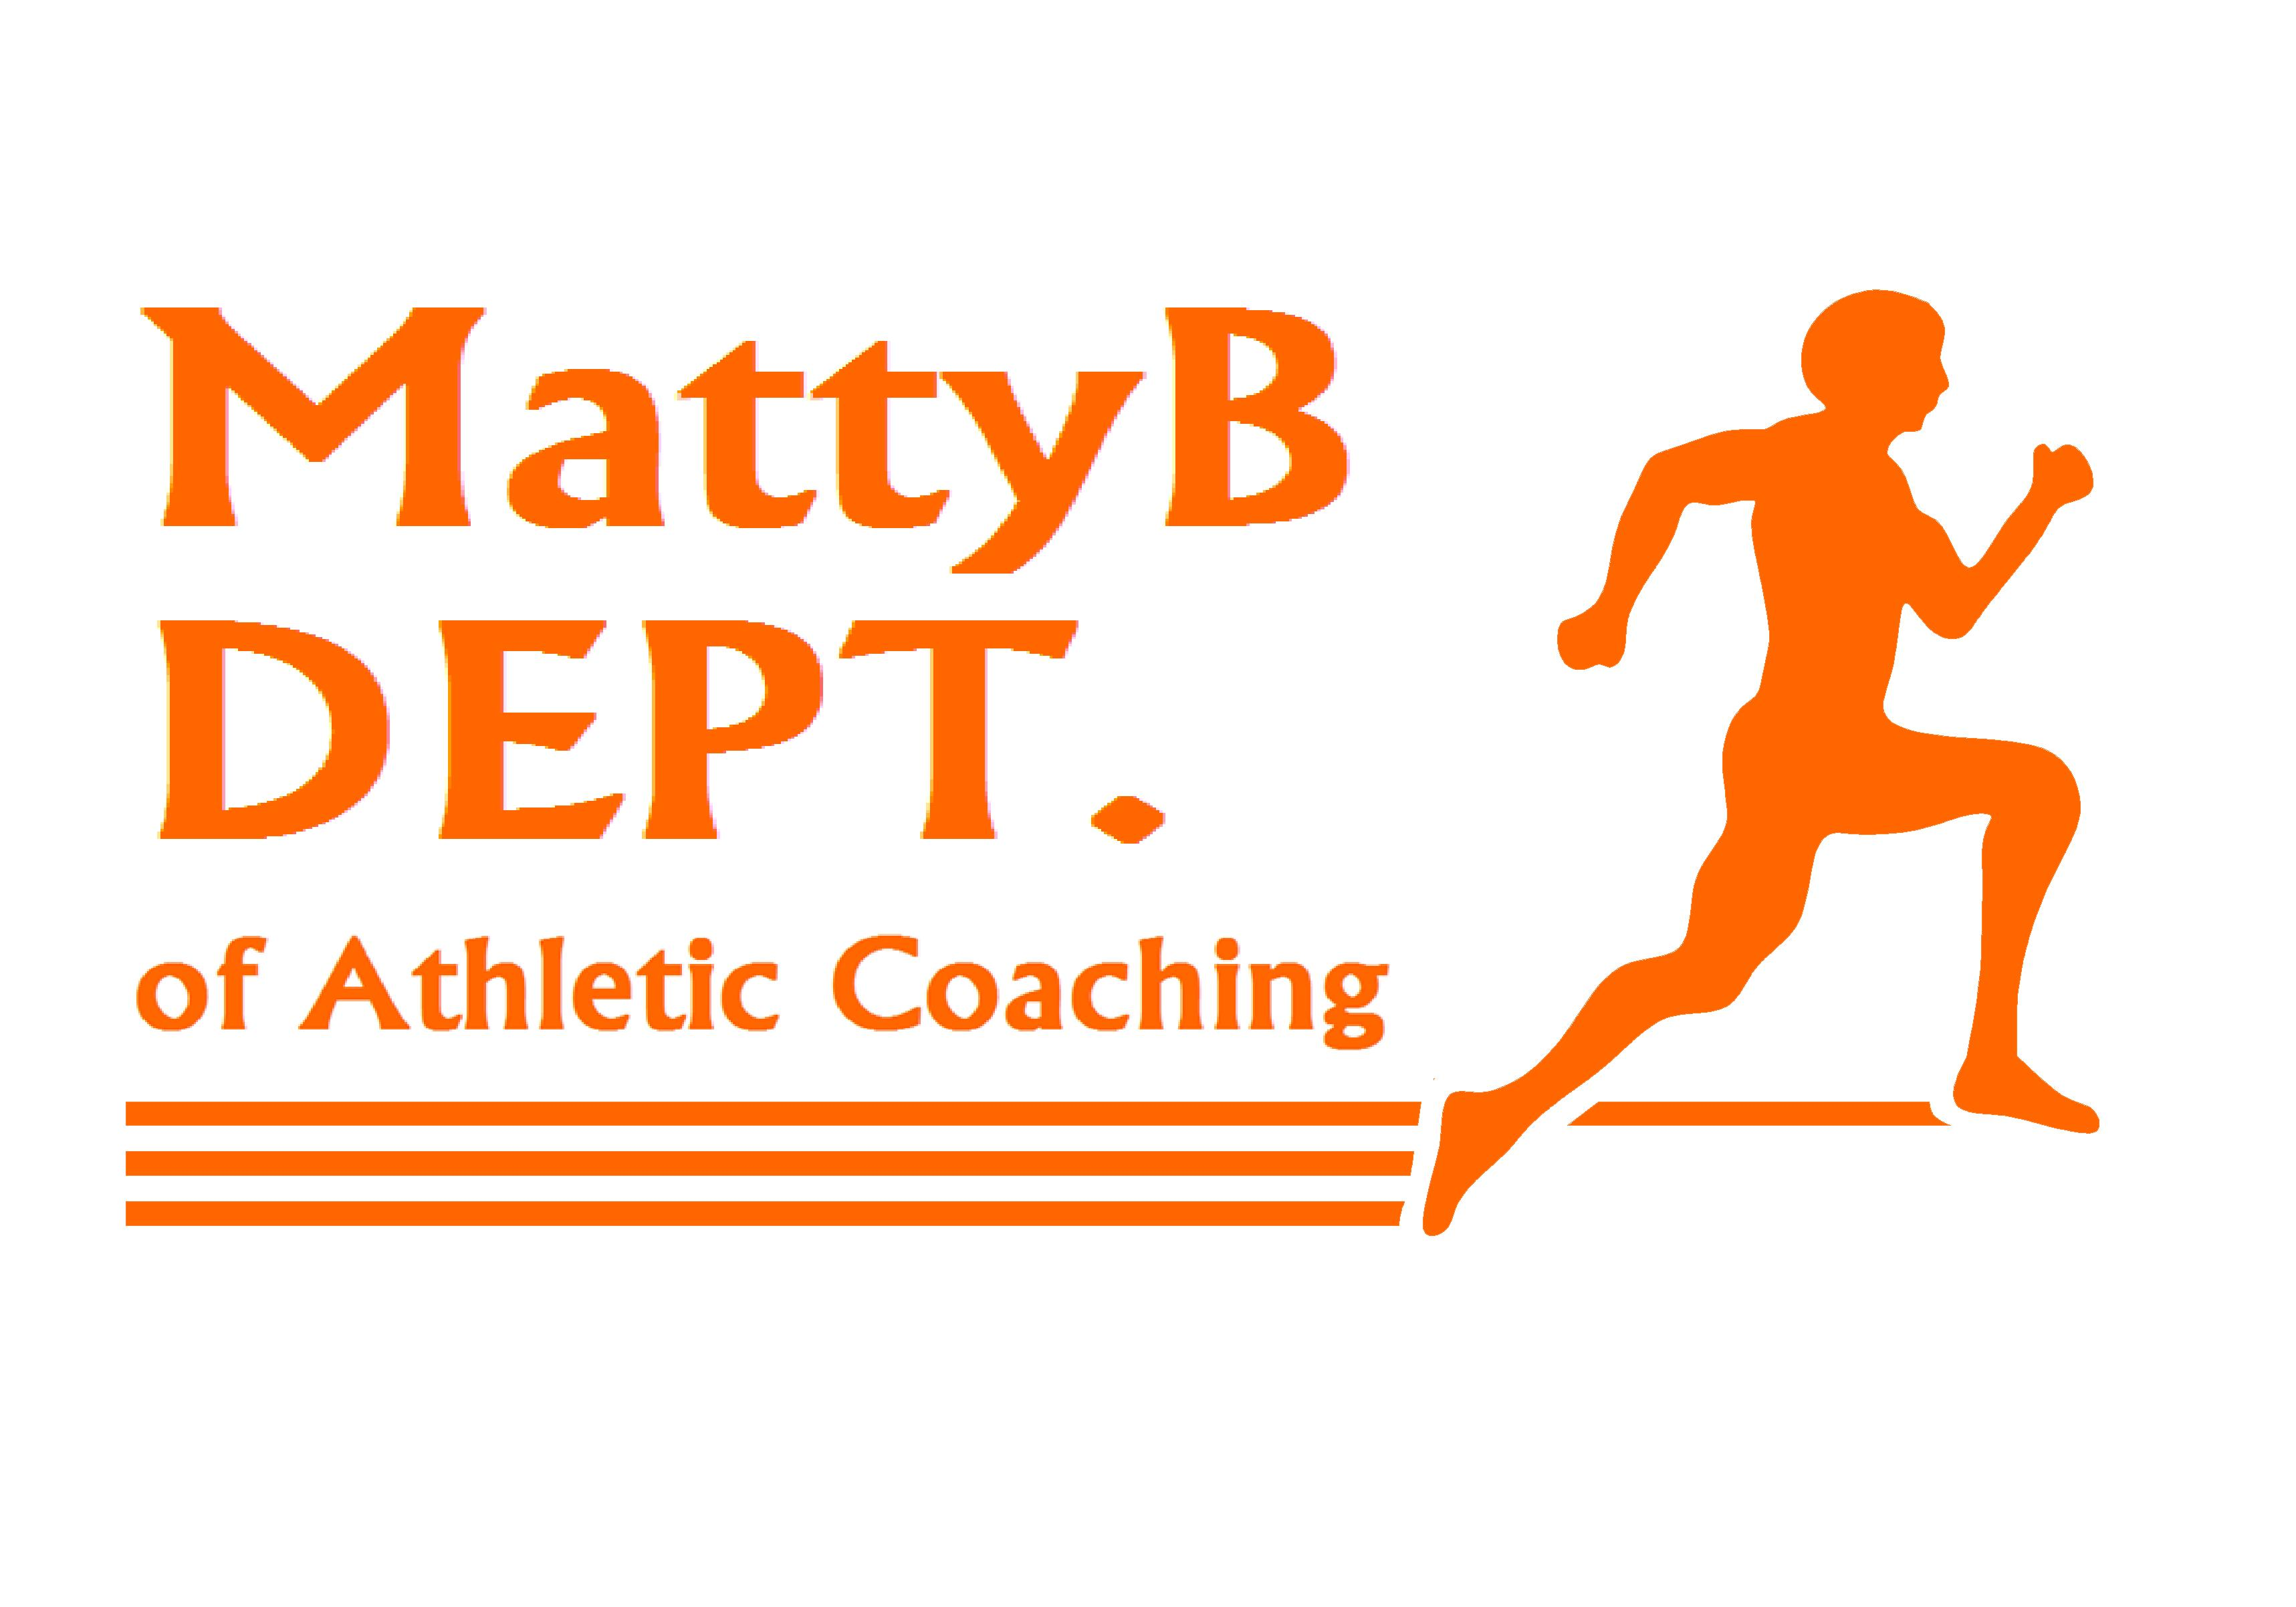 MattyB DEPT. of Ath Coach orange font